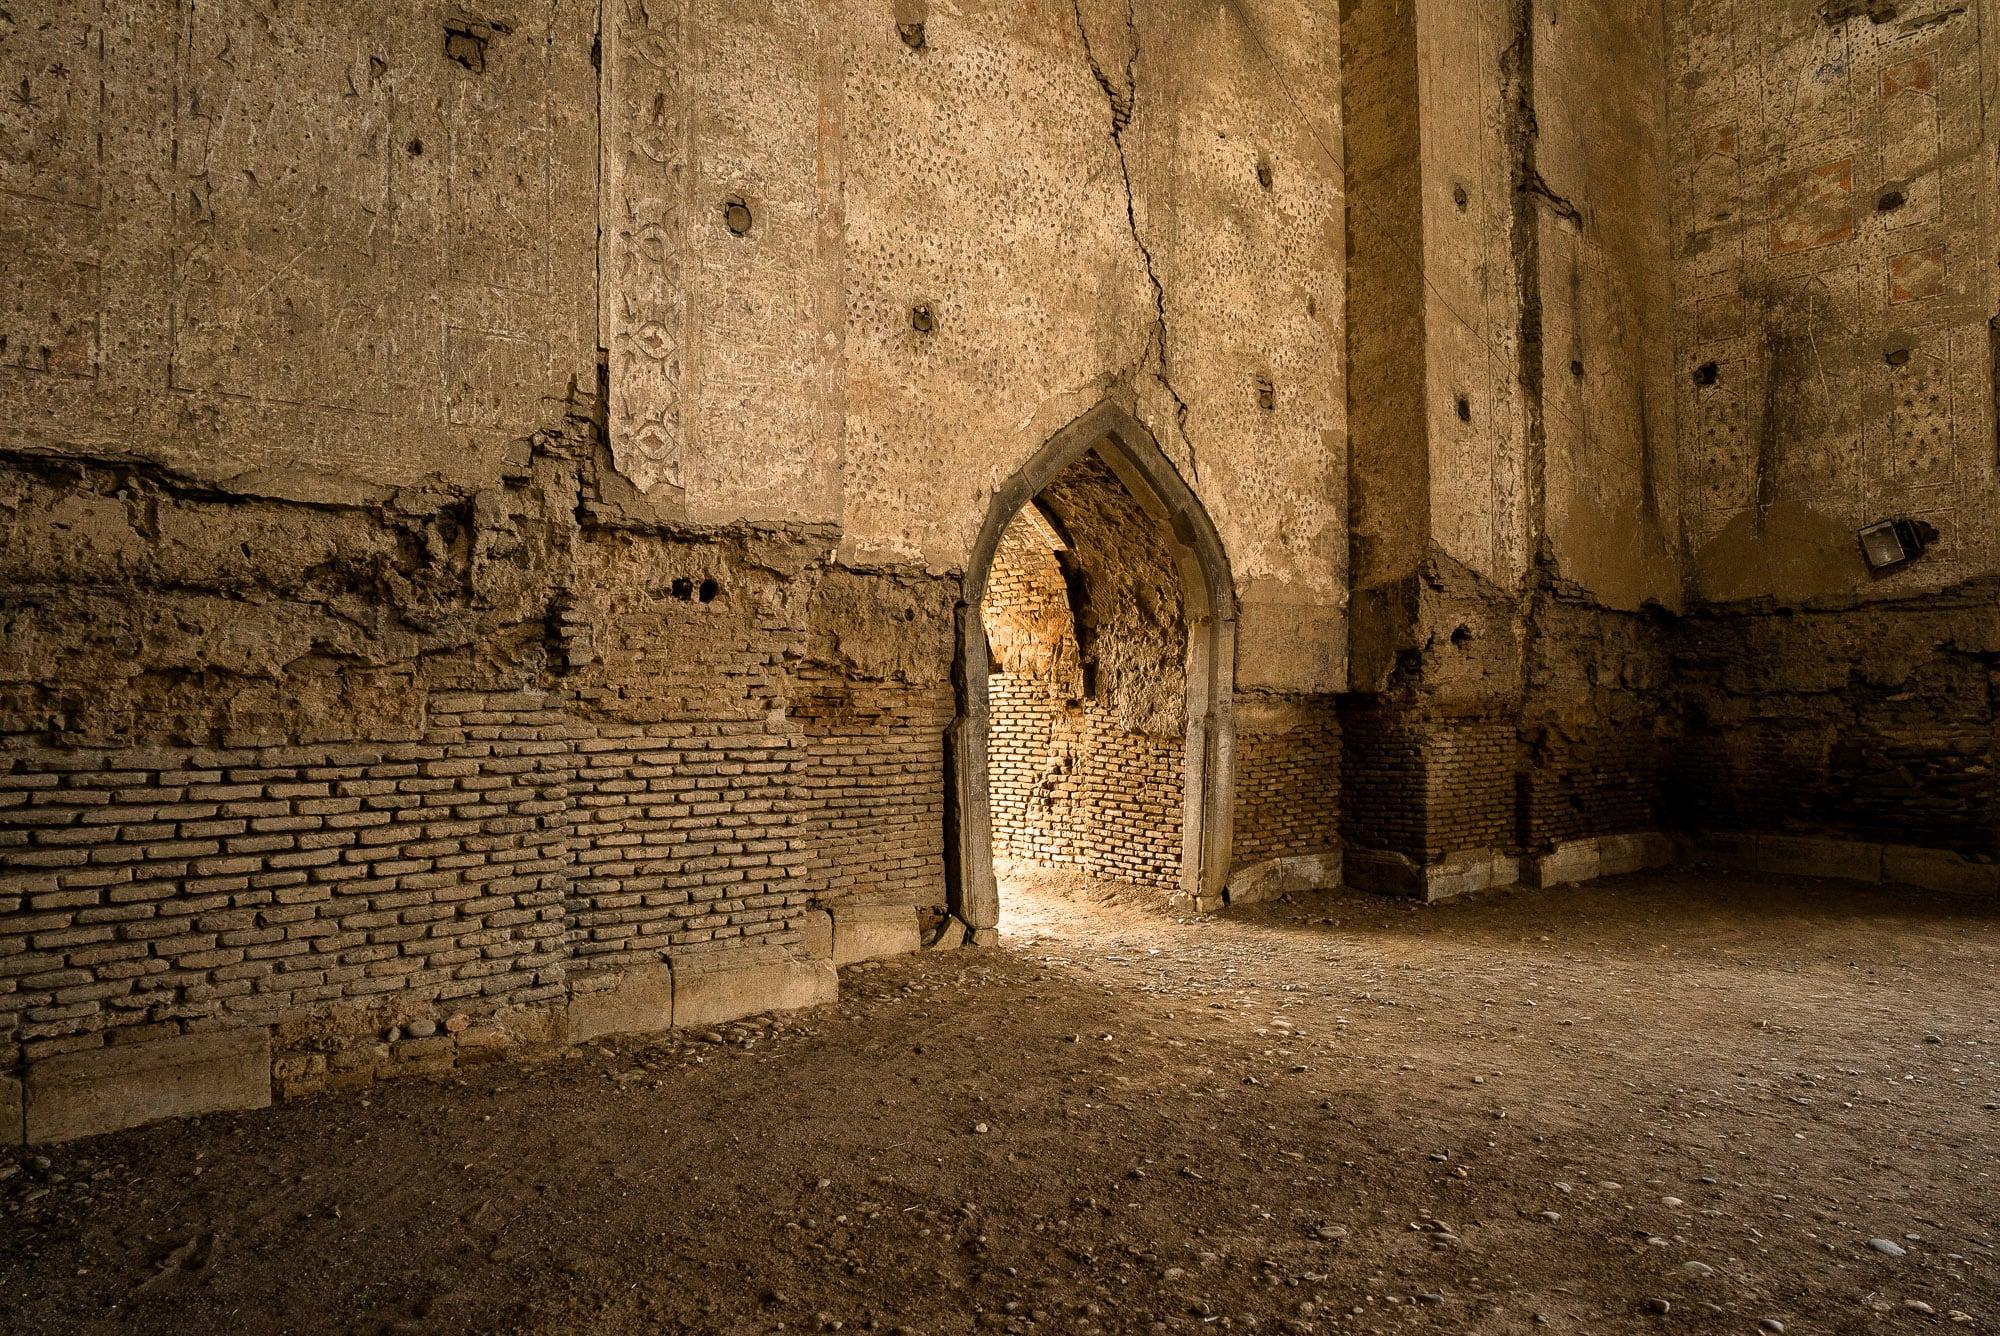 ruins of Bibi-Khanym Mosque